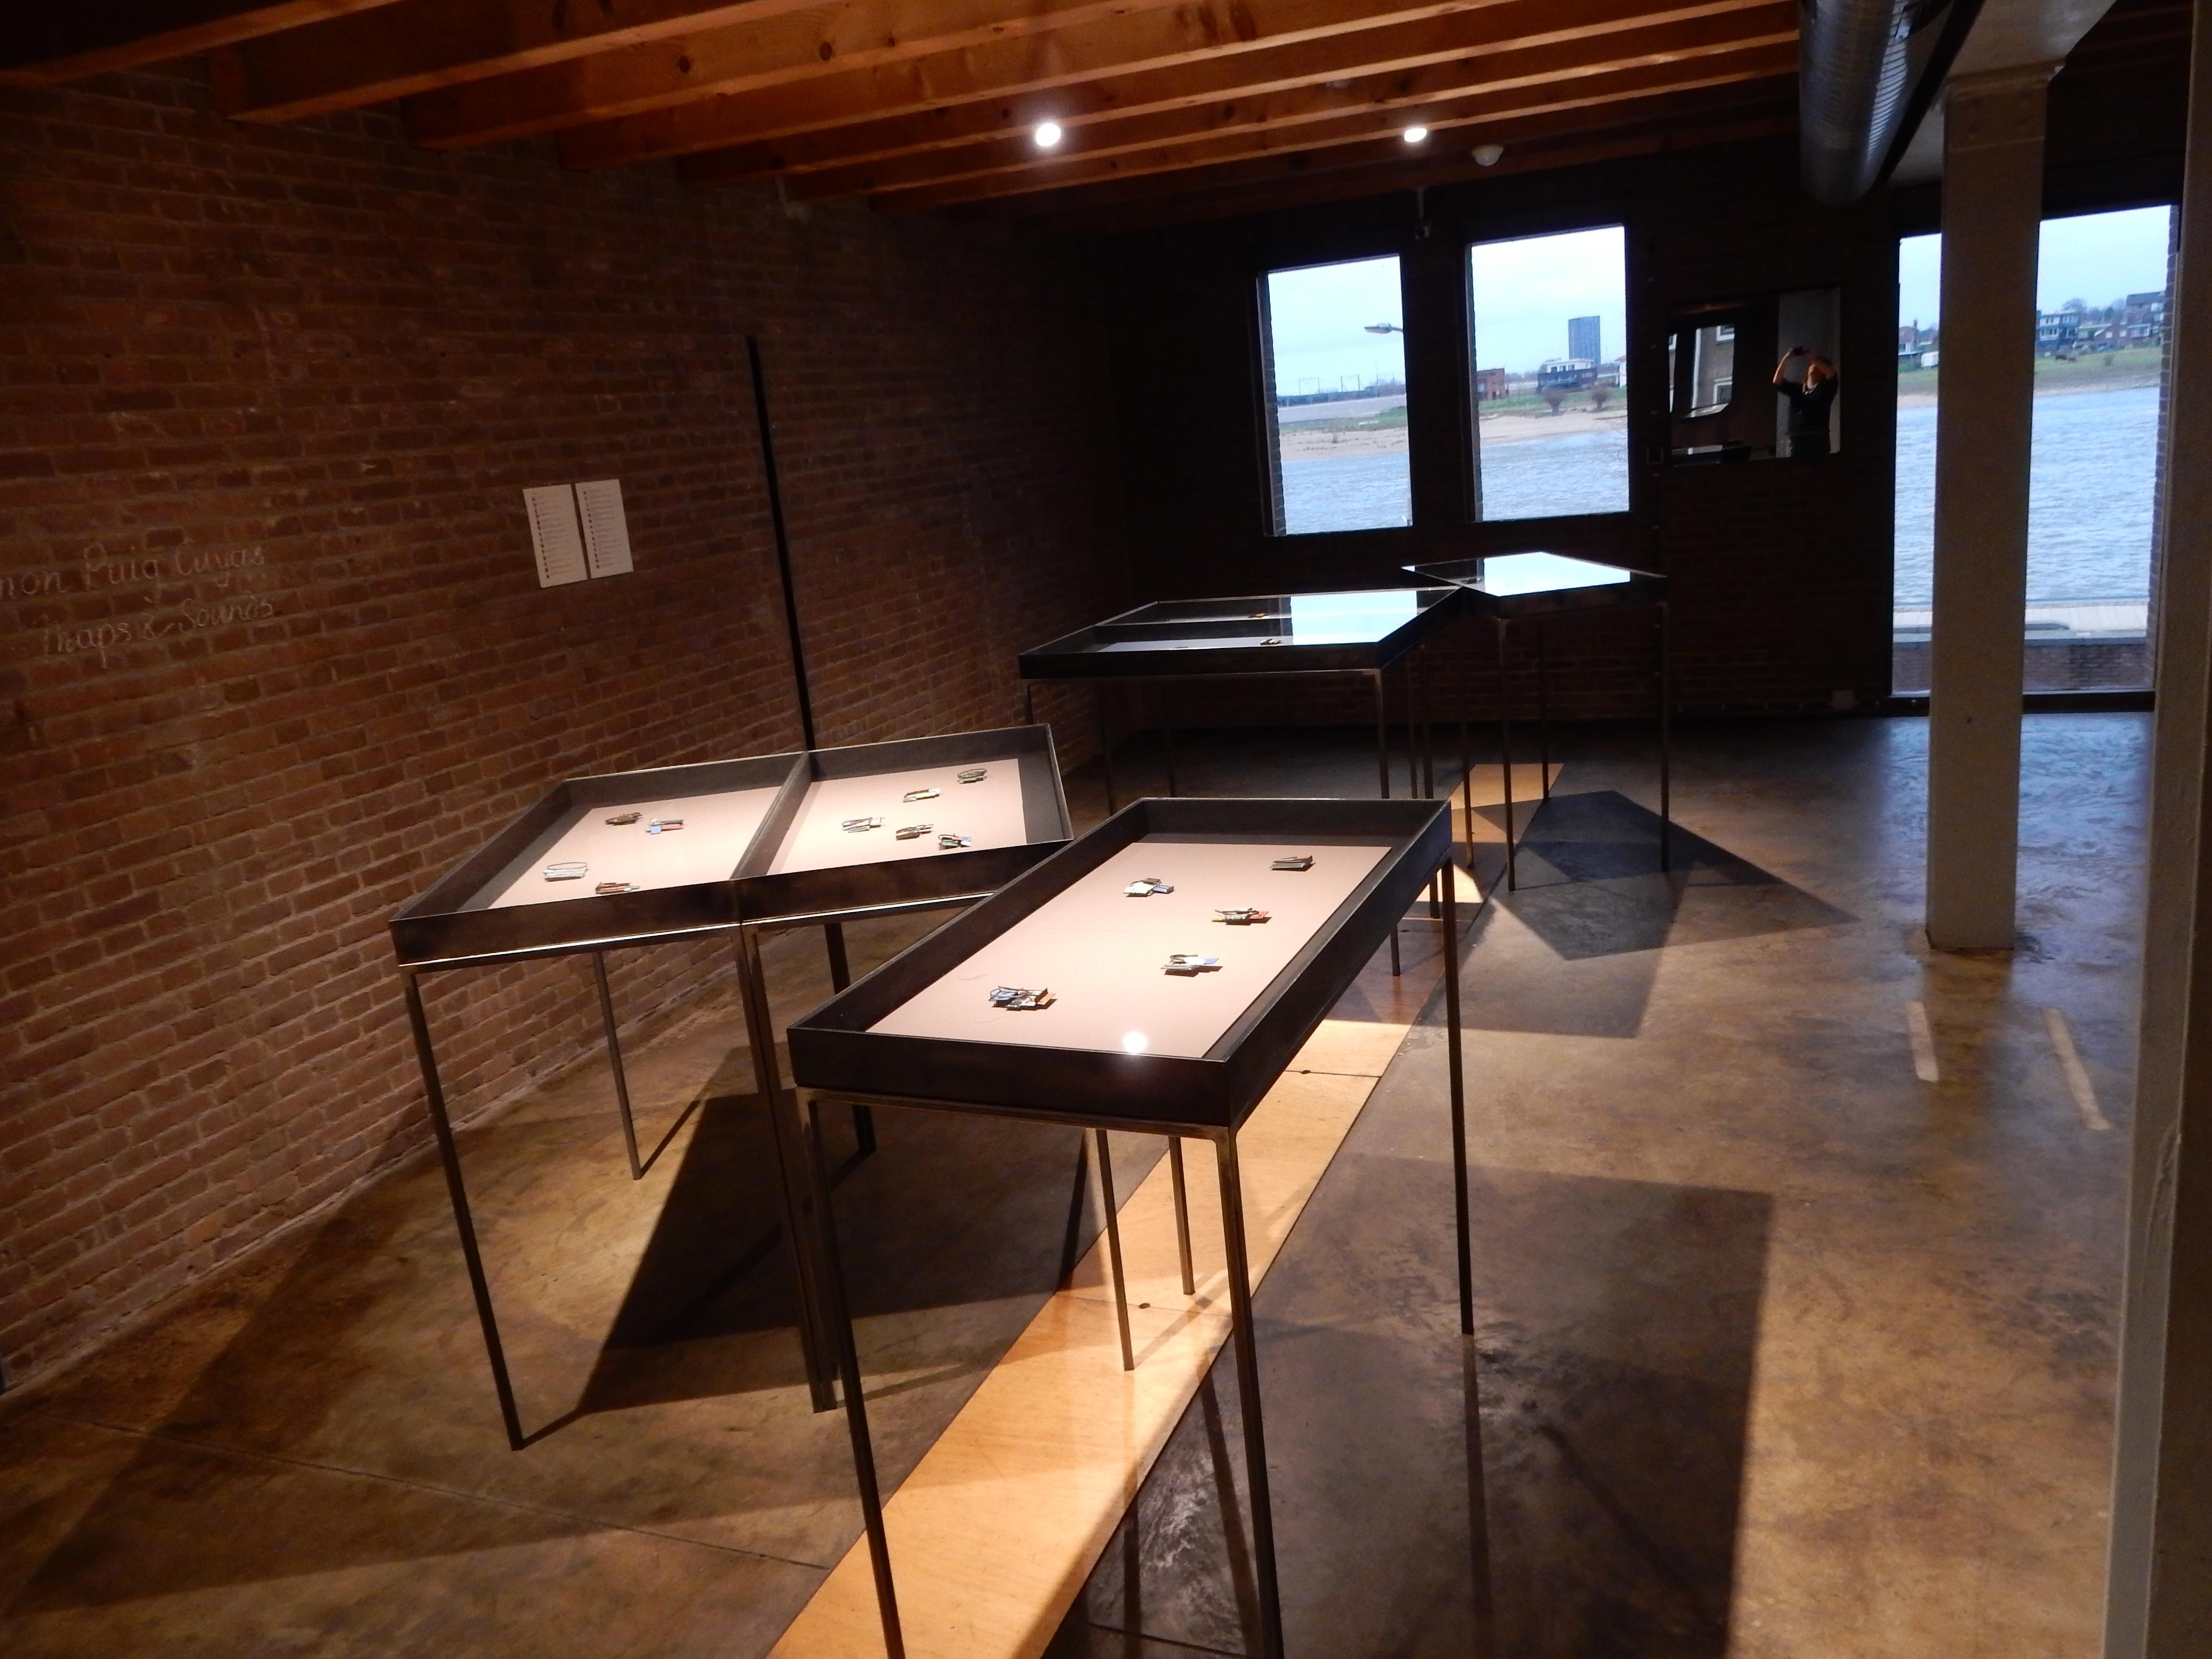 Ramón Puig Cuyàs, broches. Galerie Marzee. Foto Esther Doornbusch, 22 december 2018, CC BY 4.0